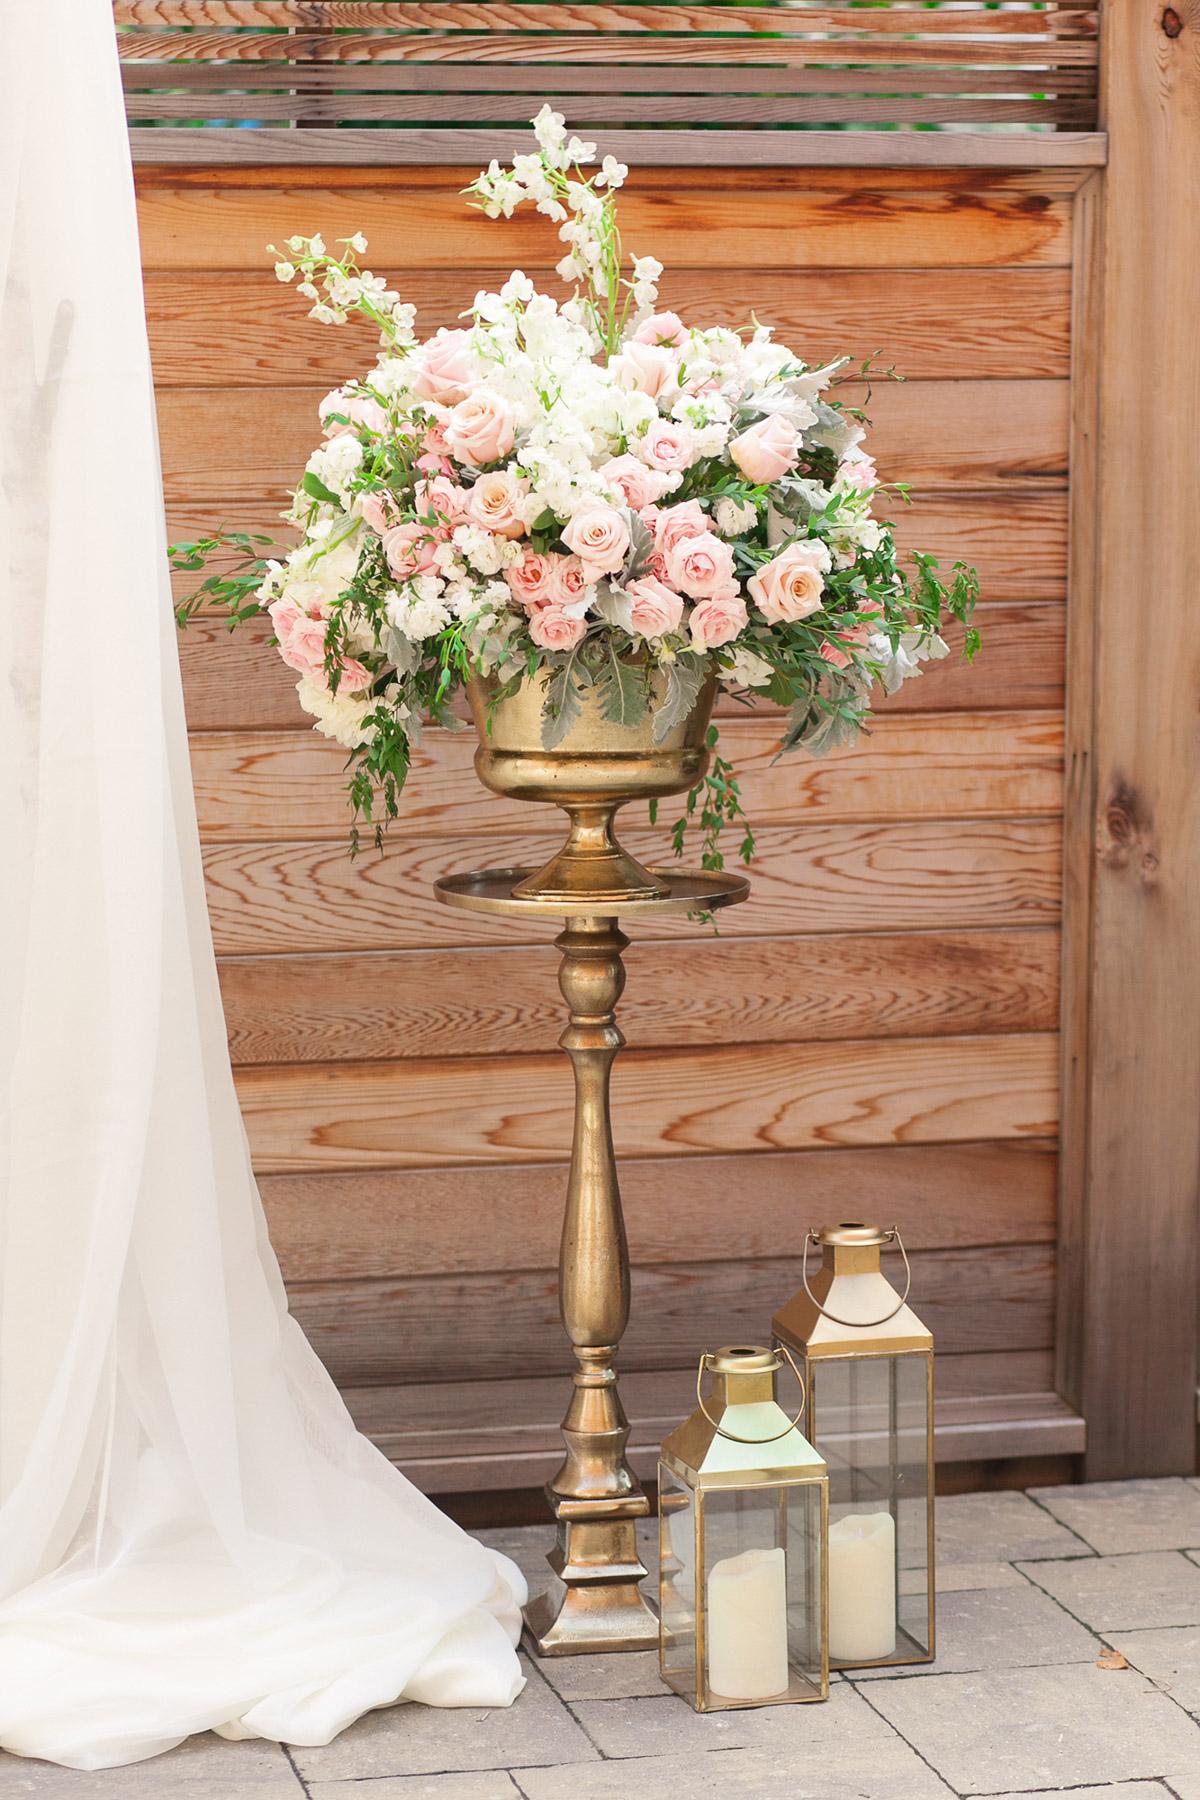 jennifer-xu-photography-vineyard-bride-swish-list-spice-factory-hamilton-wedding-26.jpg